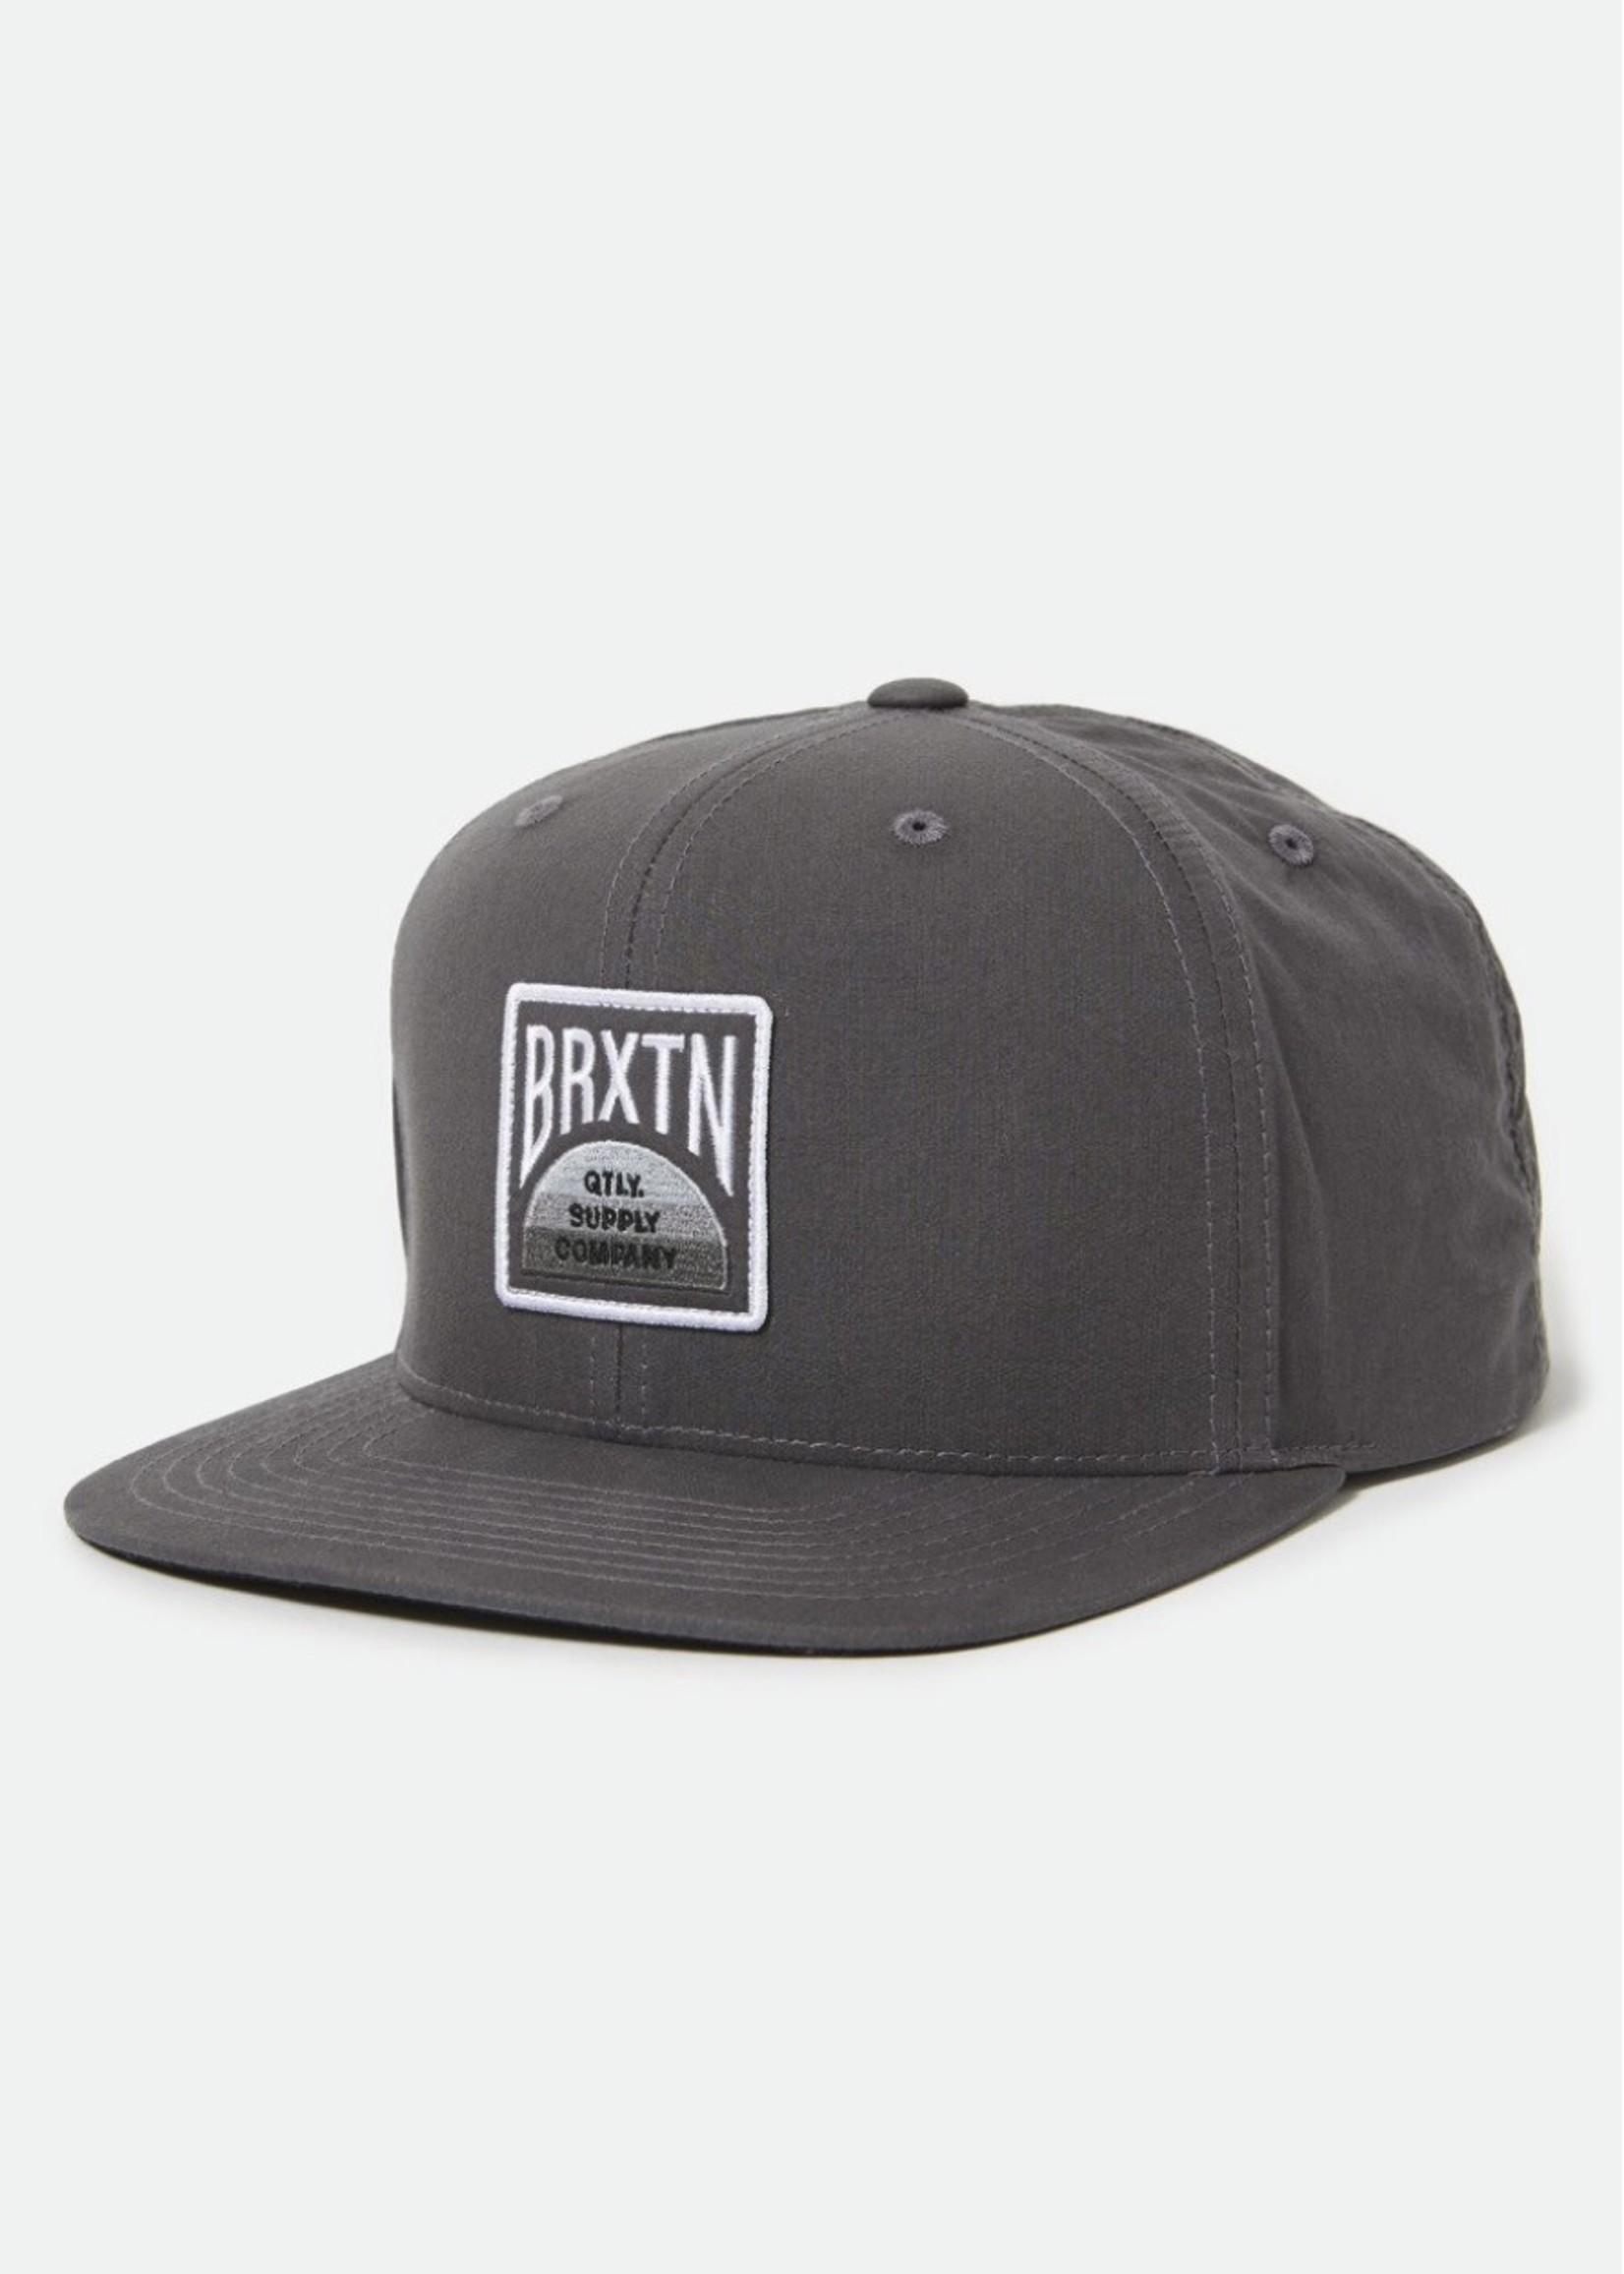 BRIXTON Pivot Snapback GREY